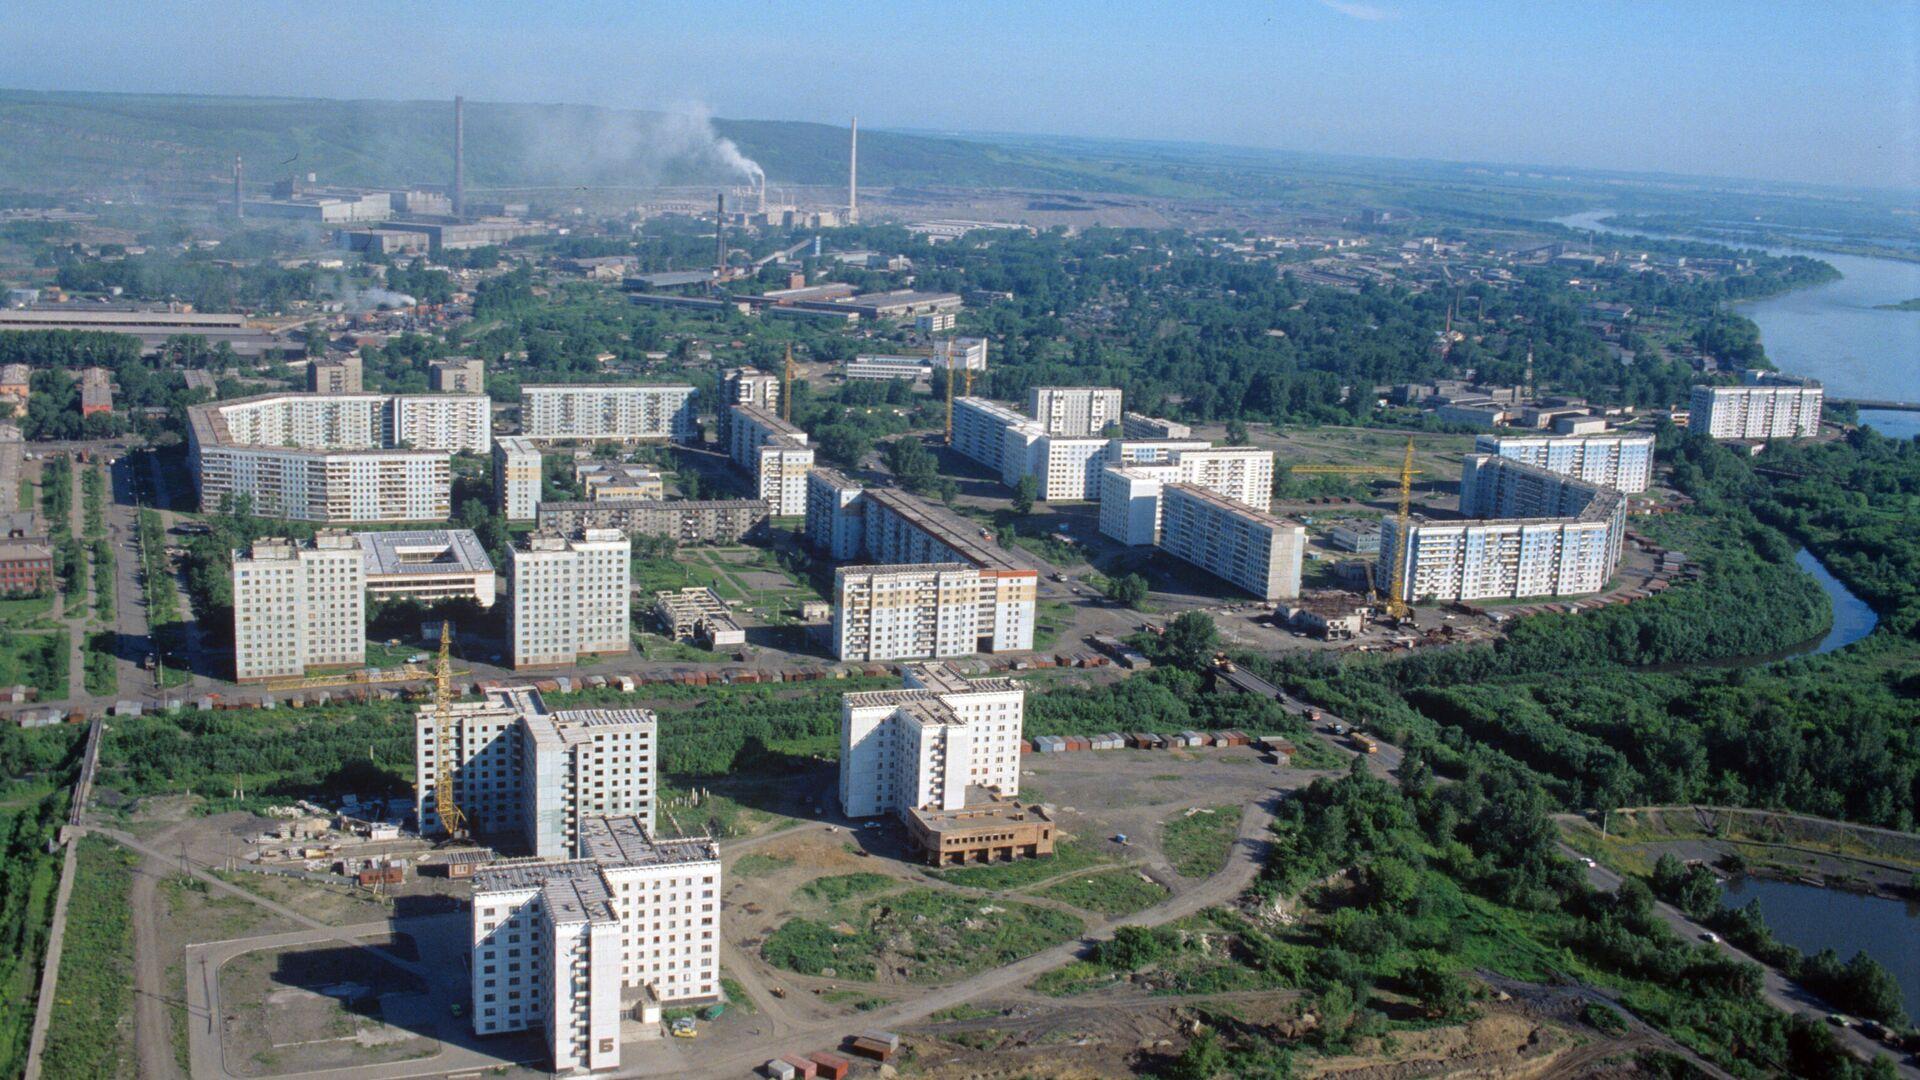 Вид на город Новокузнецк - РИА Новости, 1920, 01.10.2020